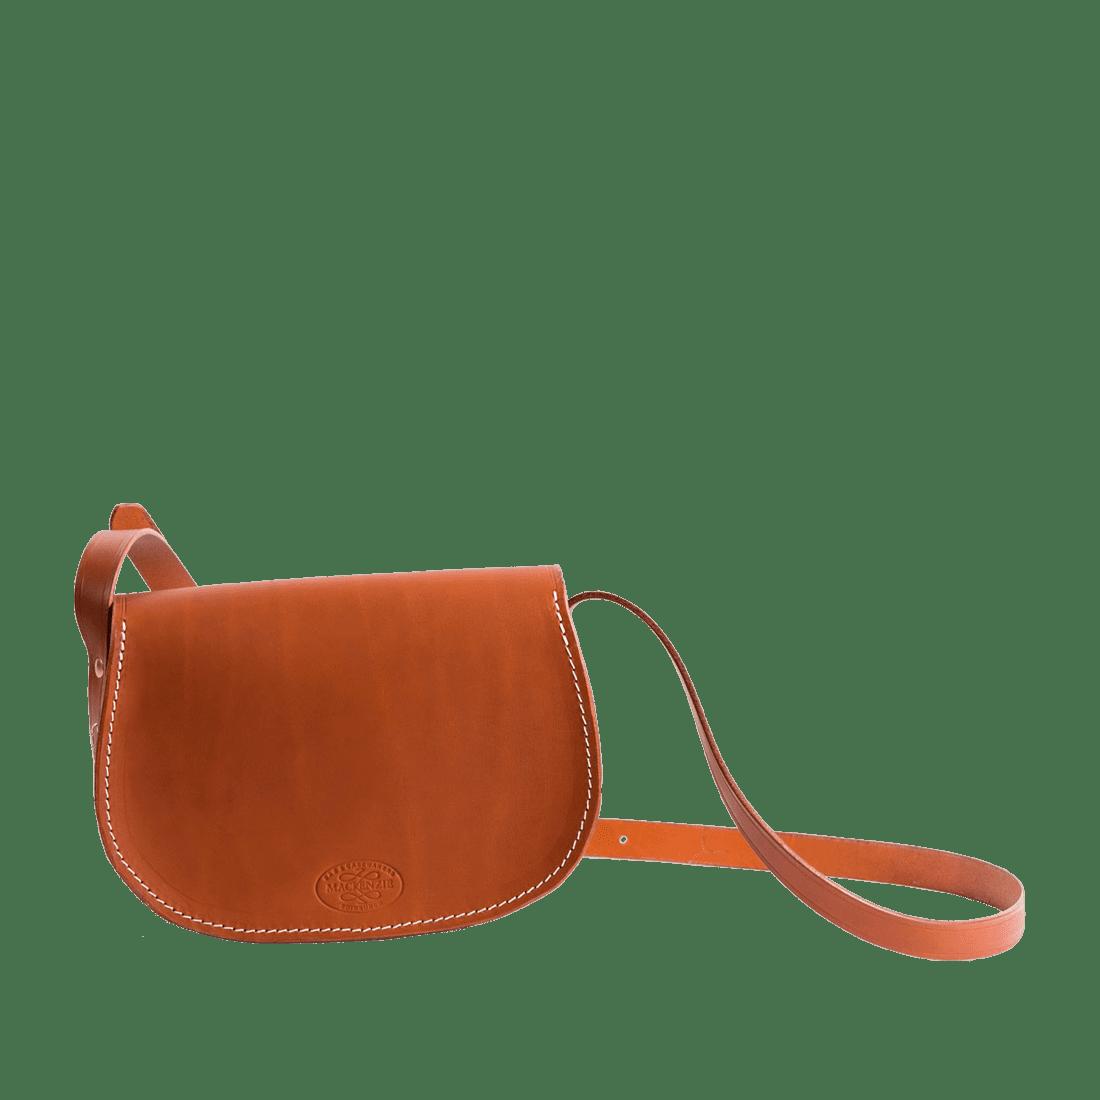 The Cartridge bag London tan